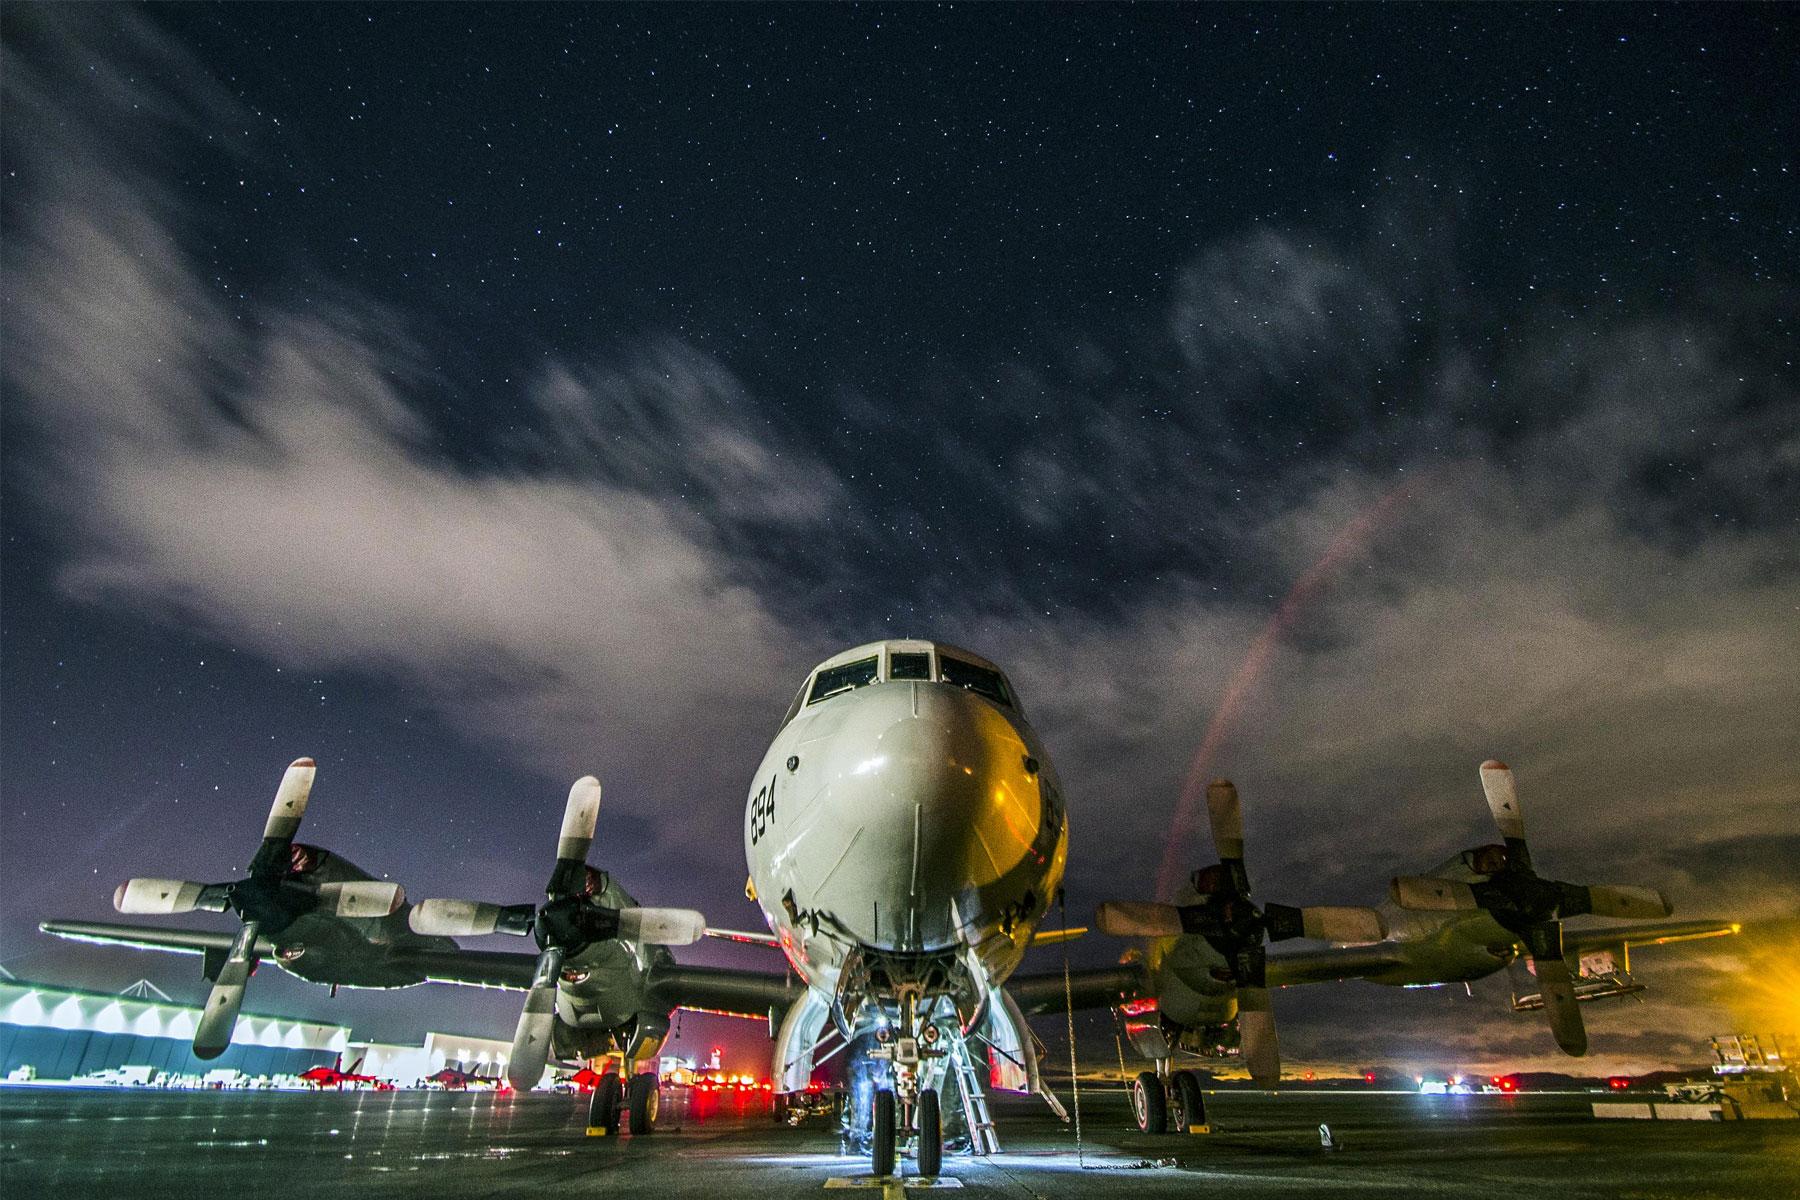 Navy Air Crew Safe After Emergency Landing in Oregon